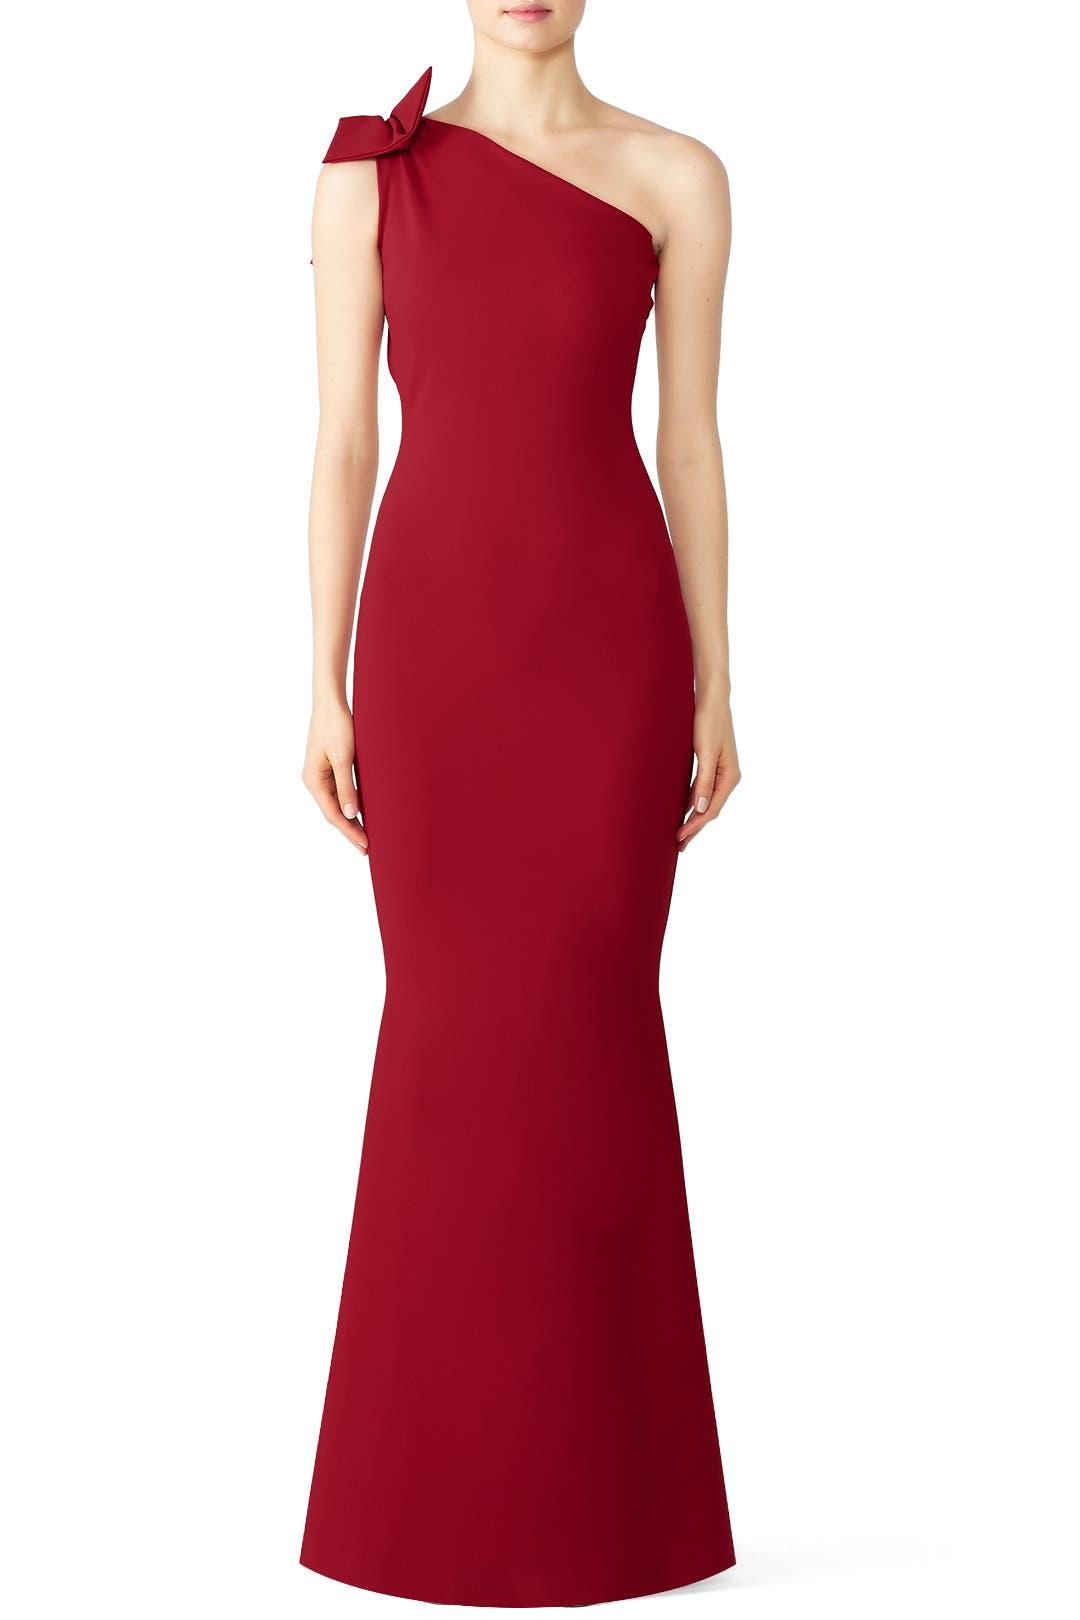 502e2d82 Red Bow Shoulder Gown by La Petite Robe di Chiara Boni for $150 - $165 |  Rent the Runway